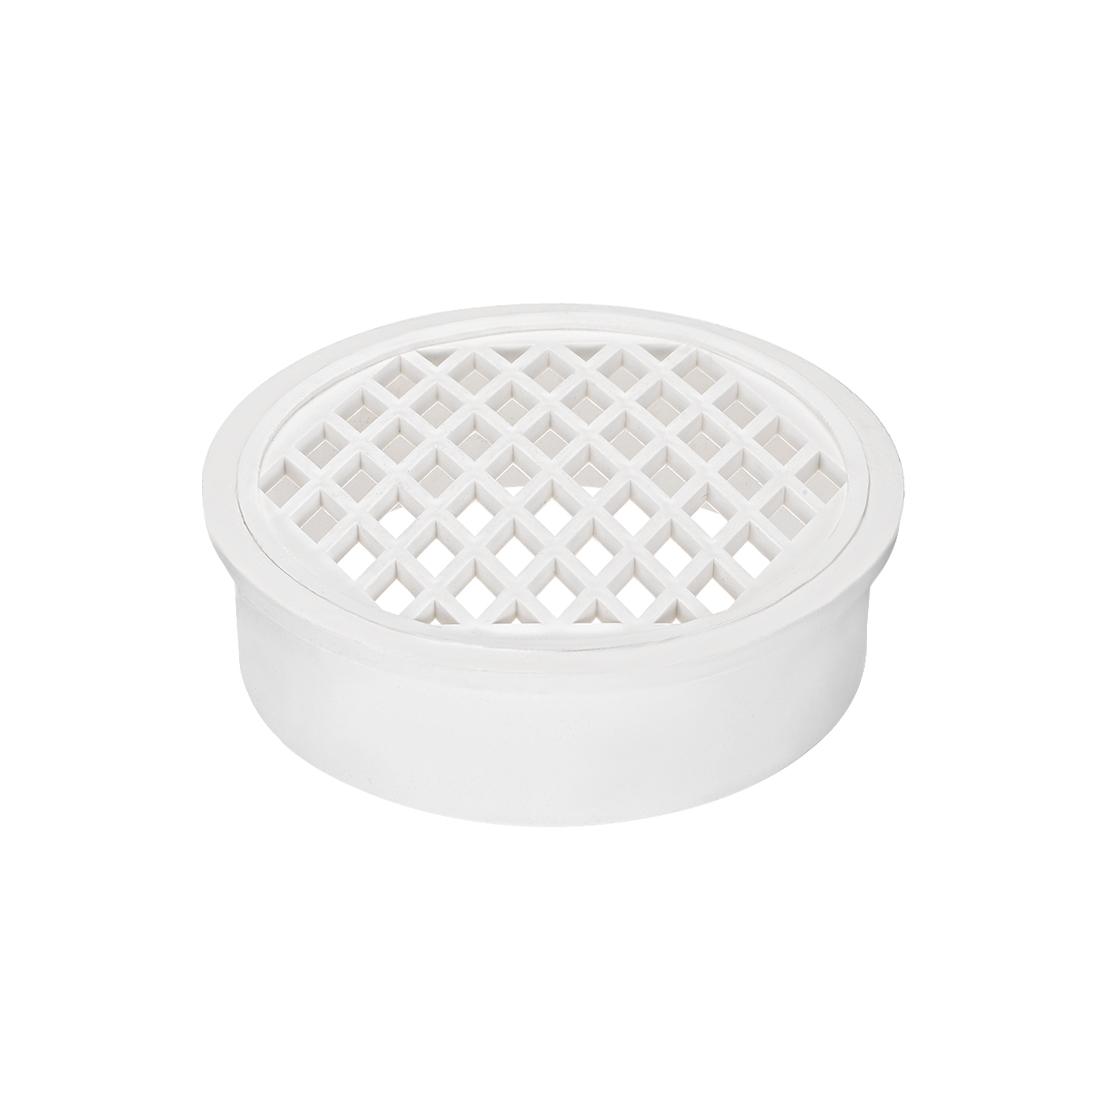 PVC Snap-In Floor Drain 6-inch Socket Bathroom Sink And Tub Drain Strainers